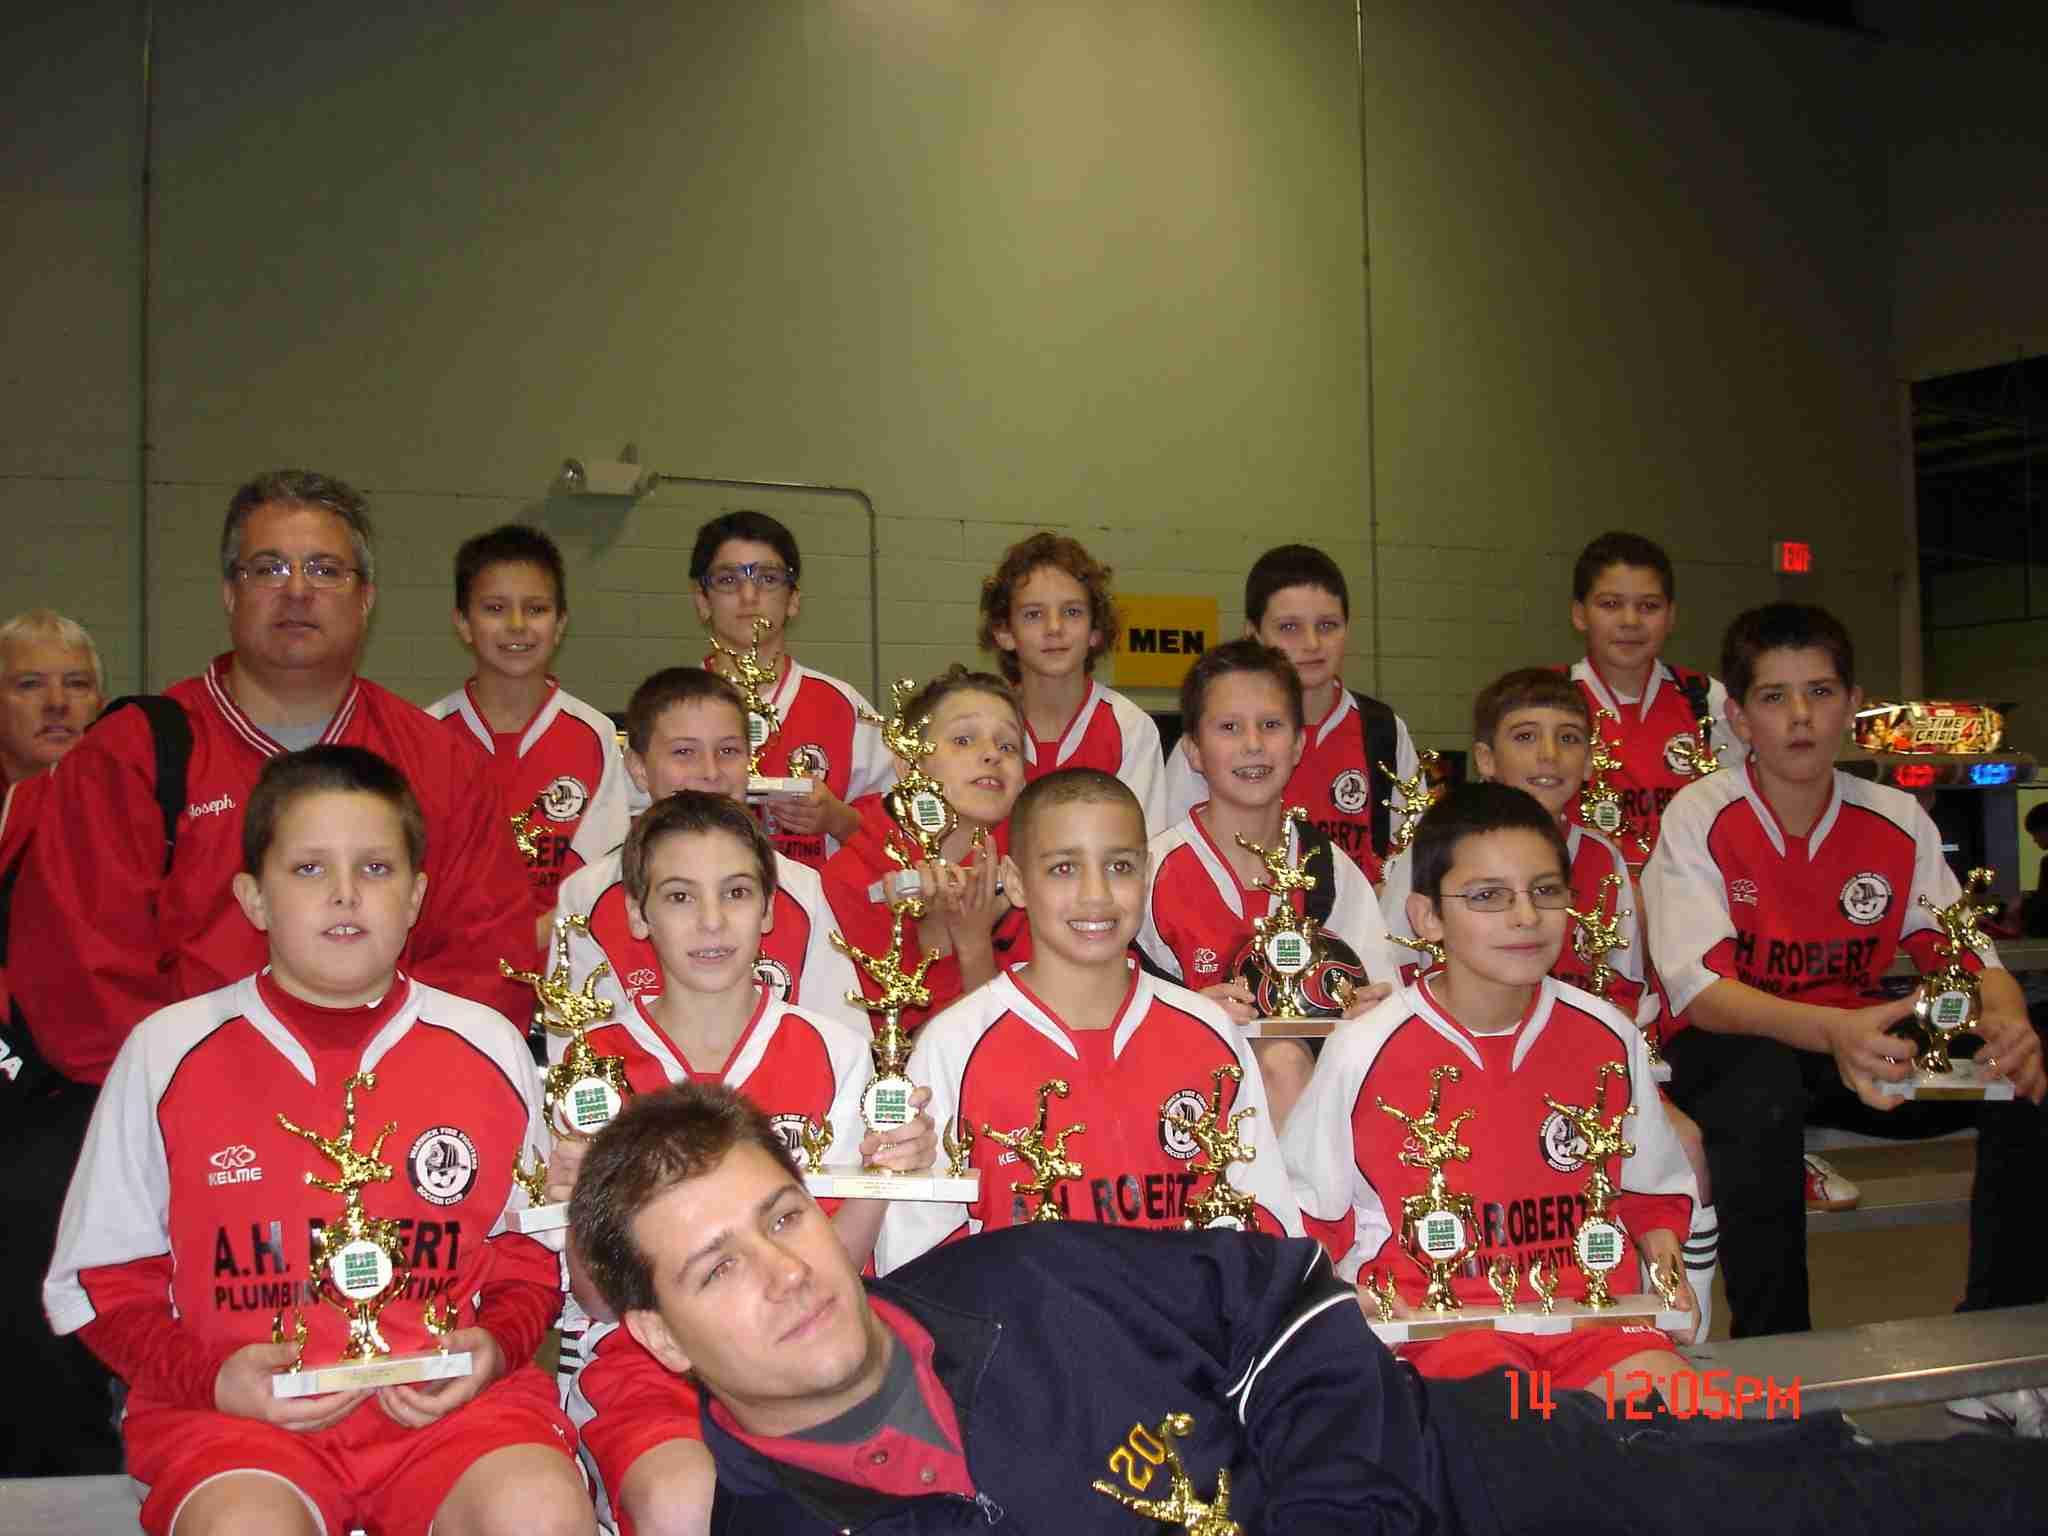 U12 Boys RI Indoor Session 1 Champs